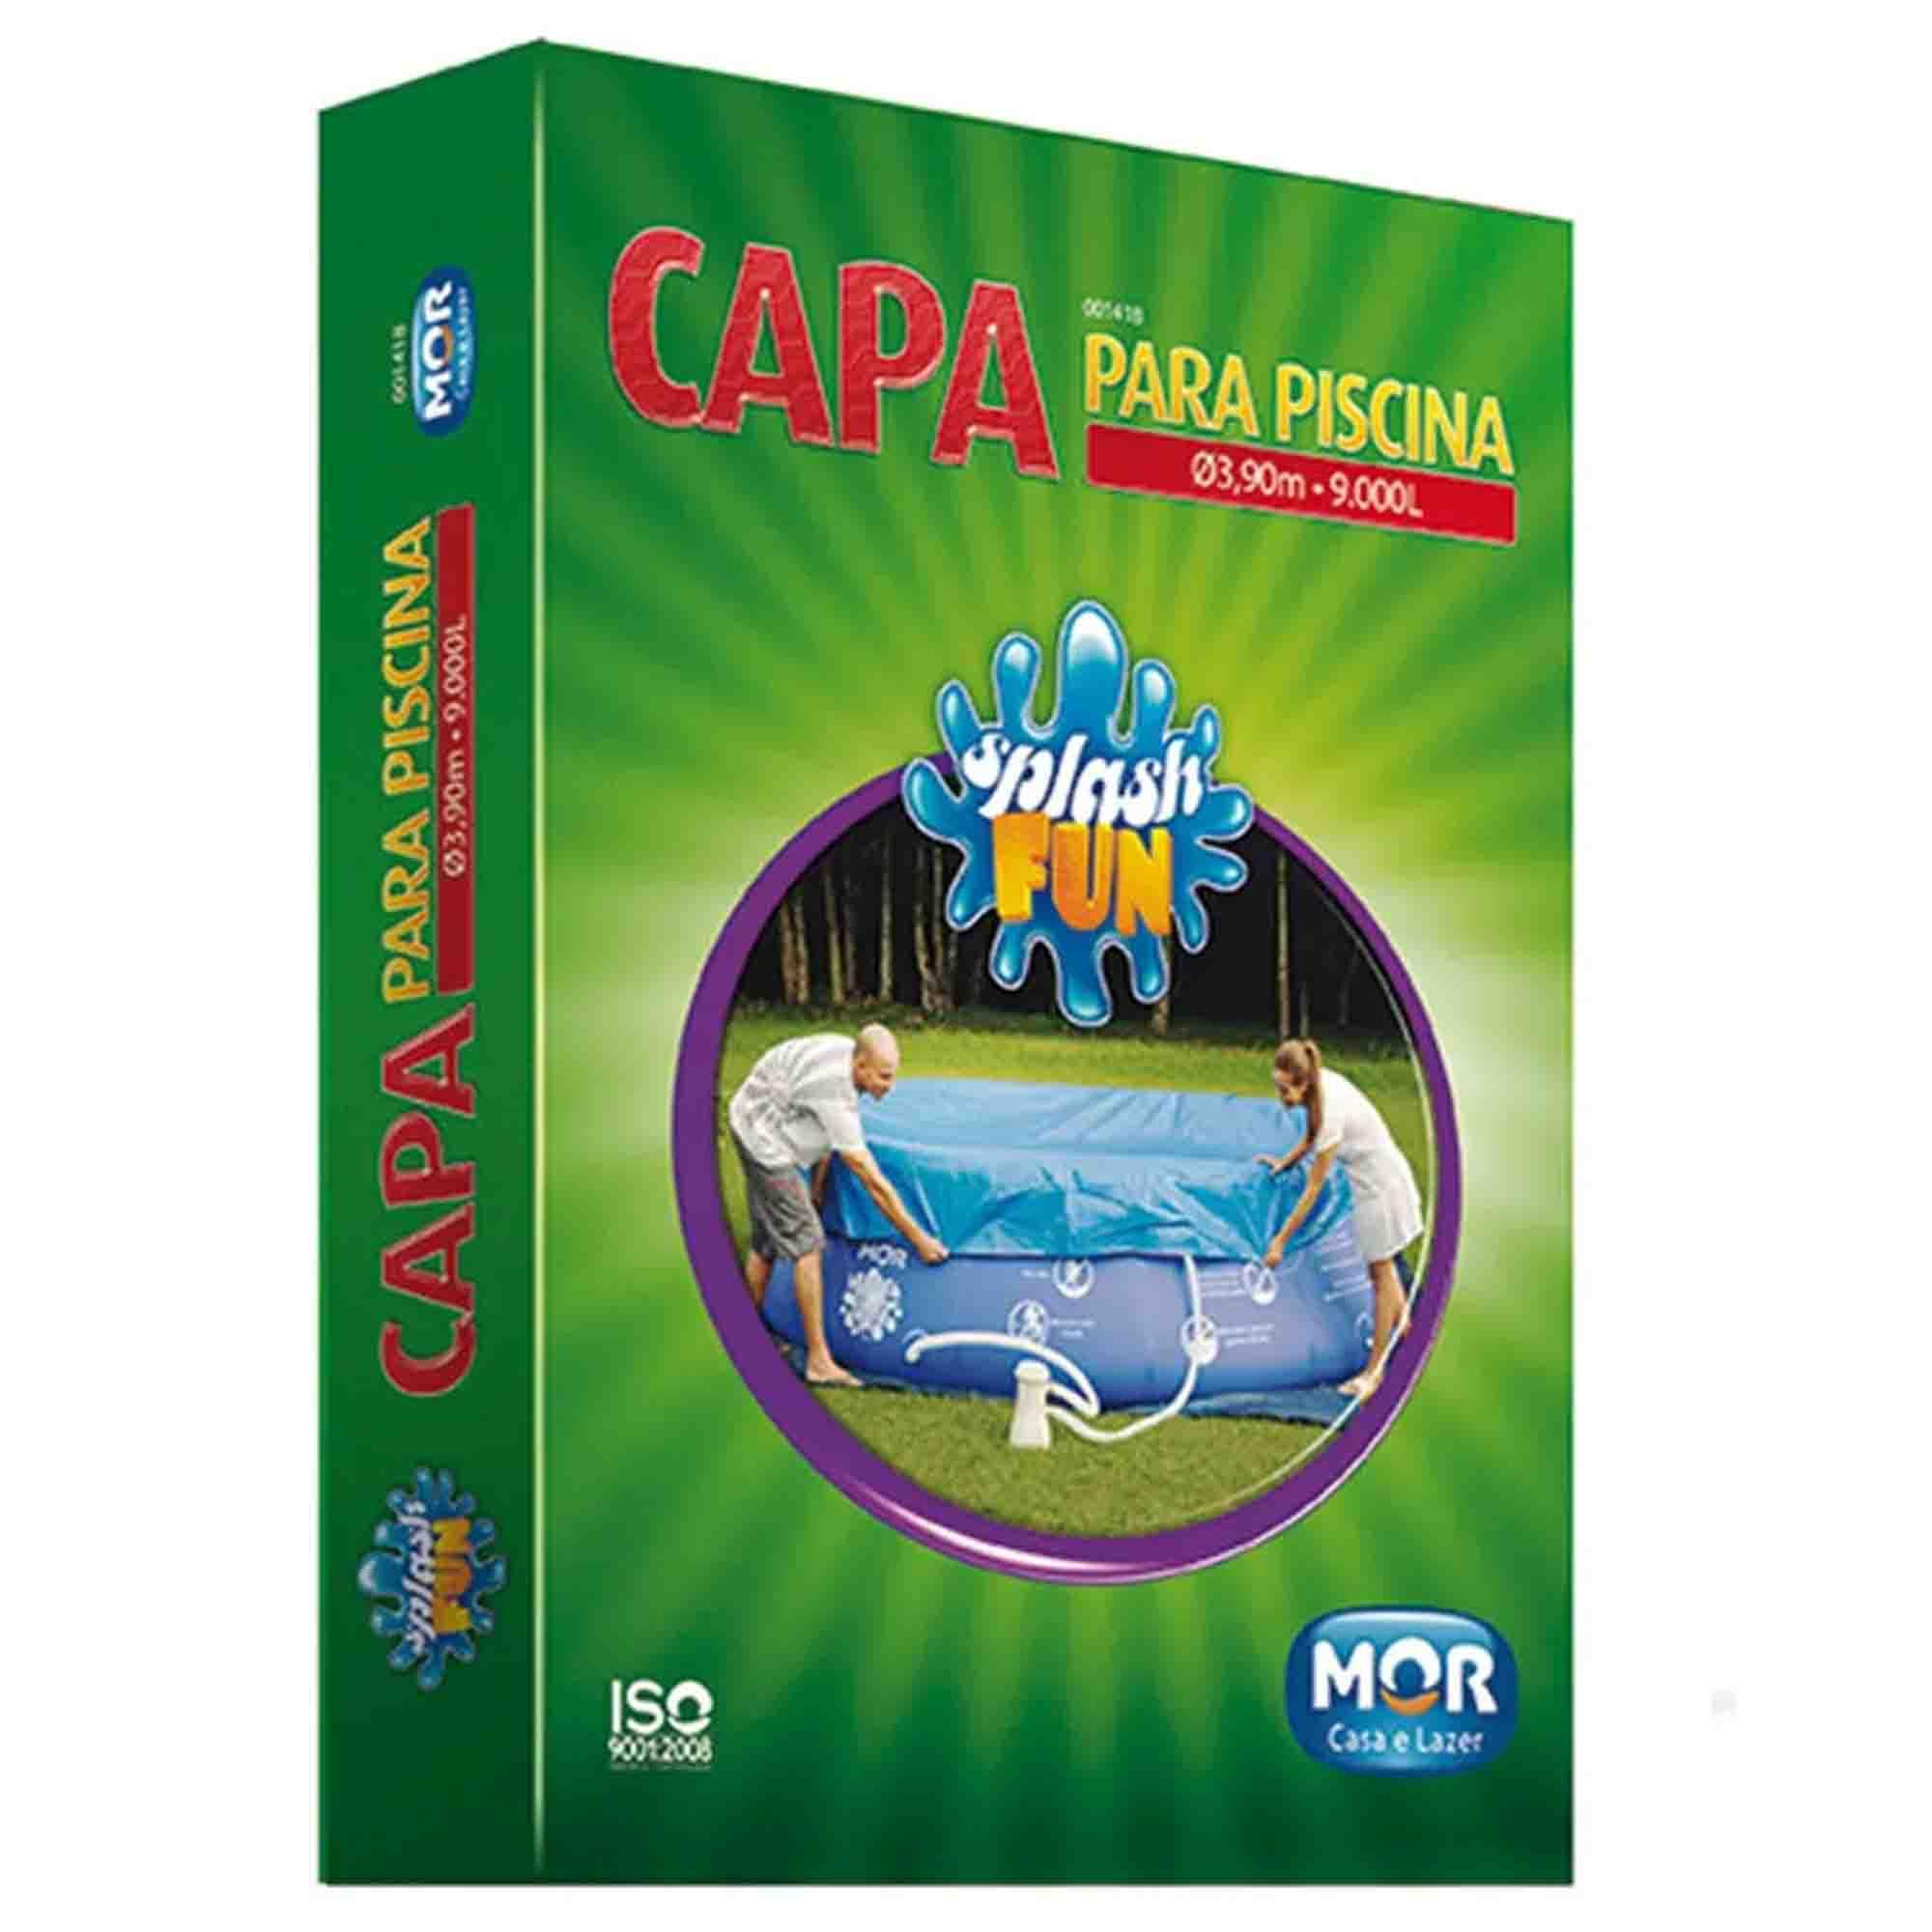 CAPA PARA PISCINA SPLASH FUN 3,90MX9,000L - MOR